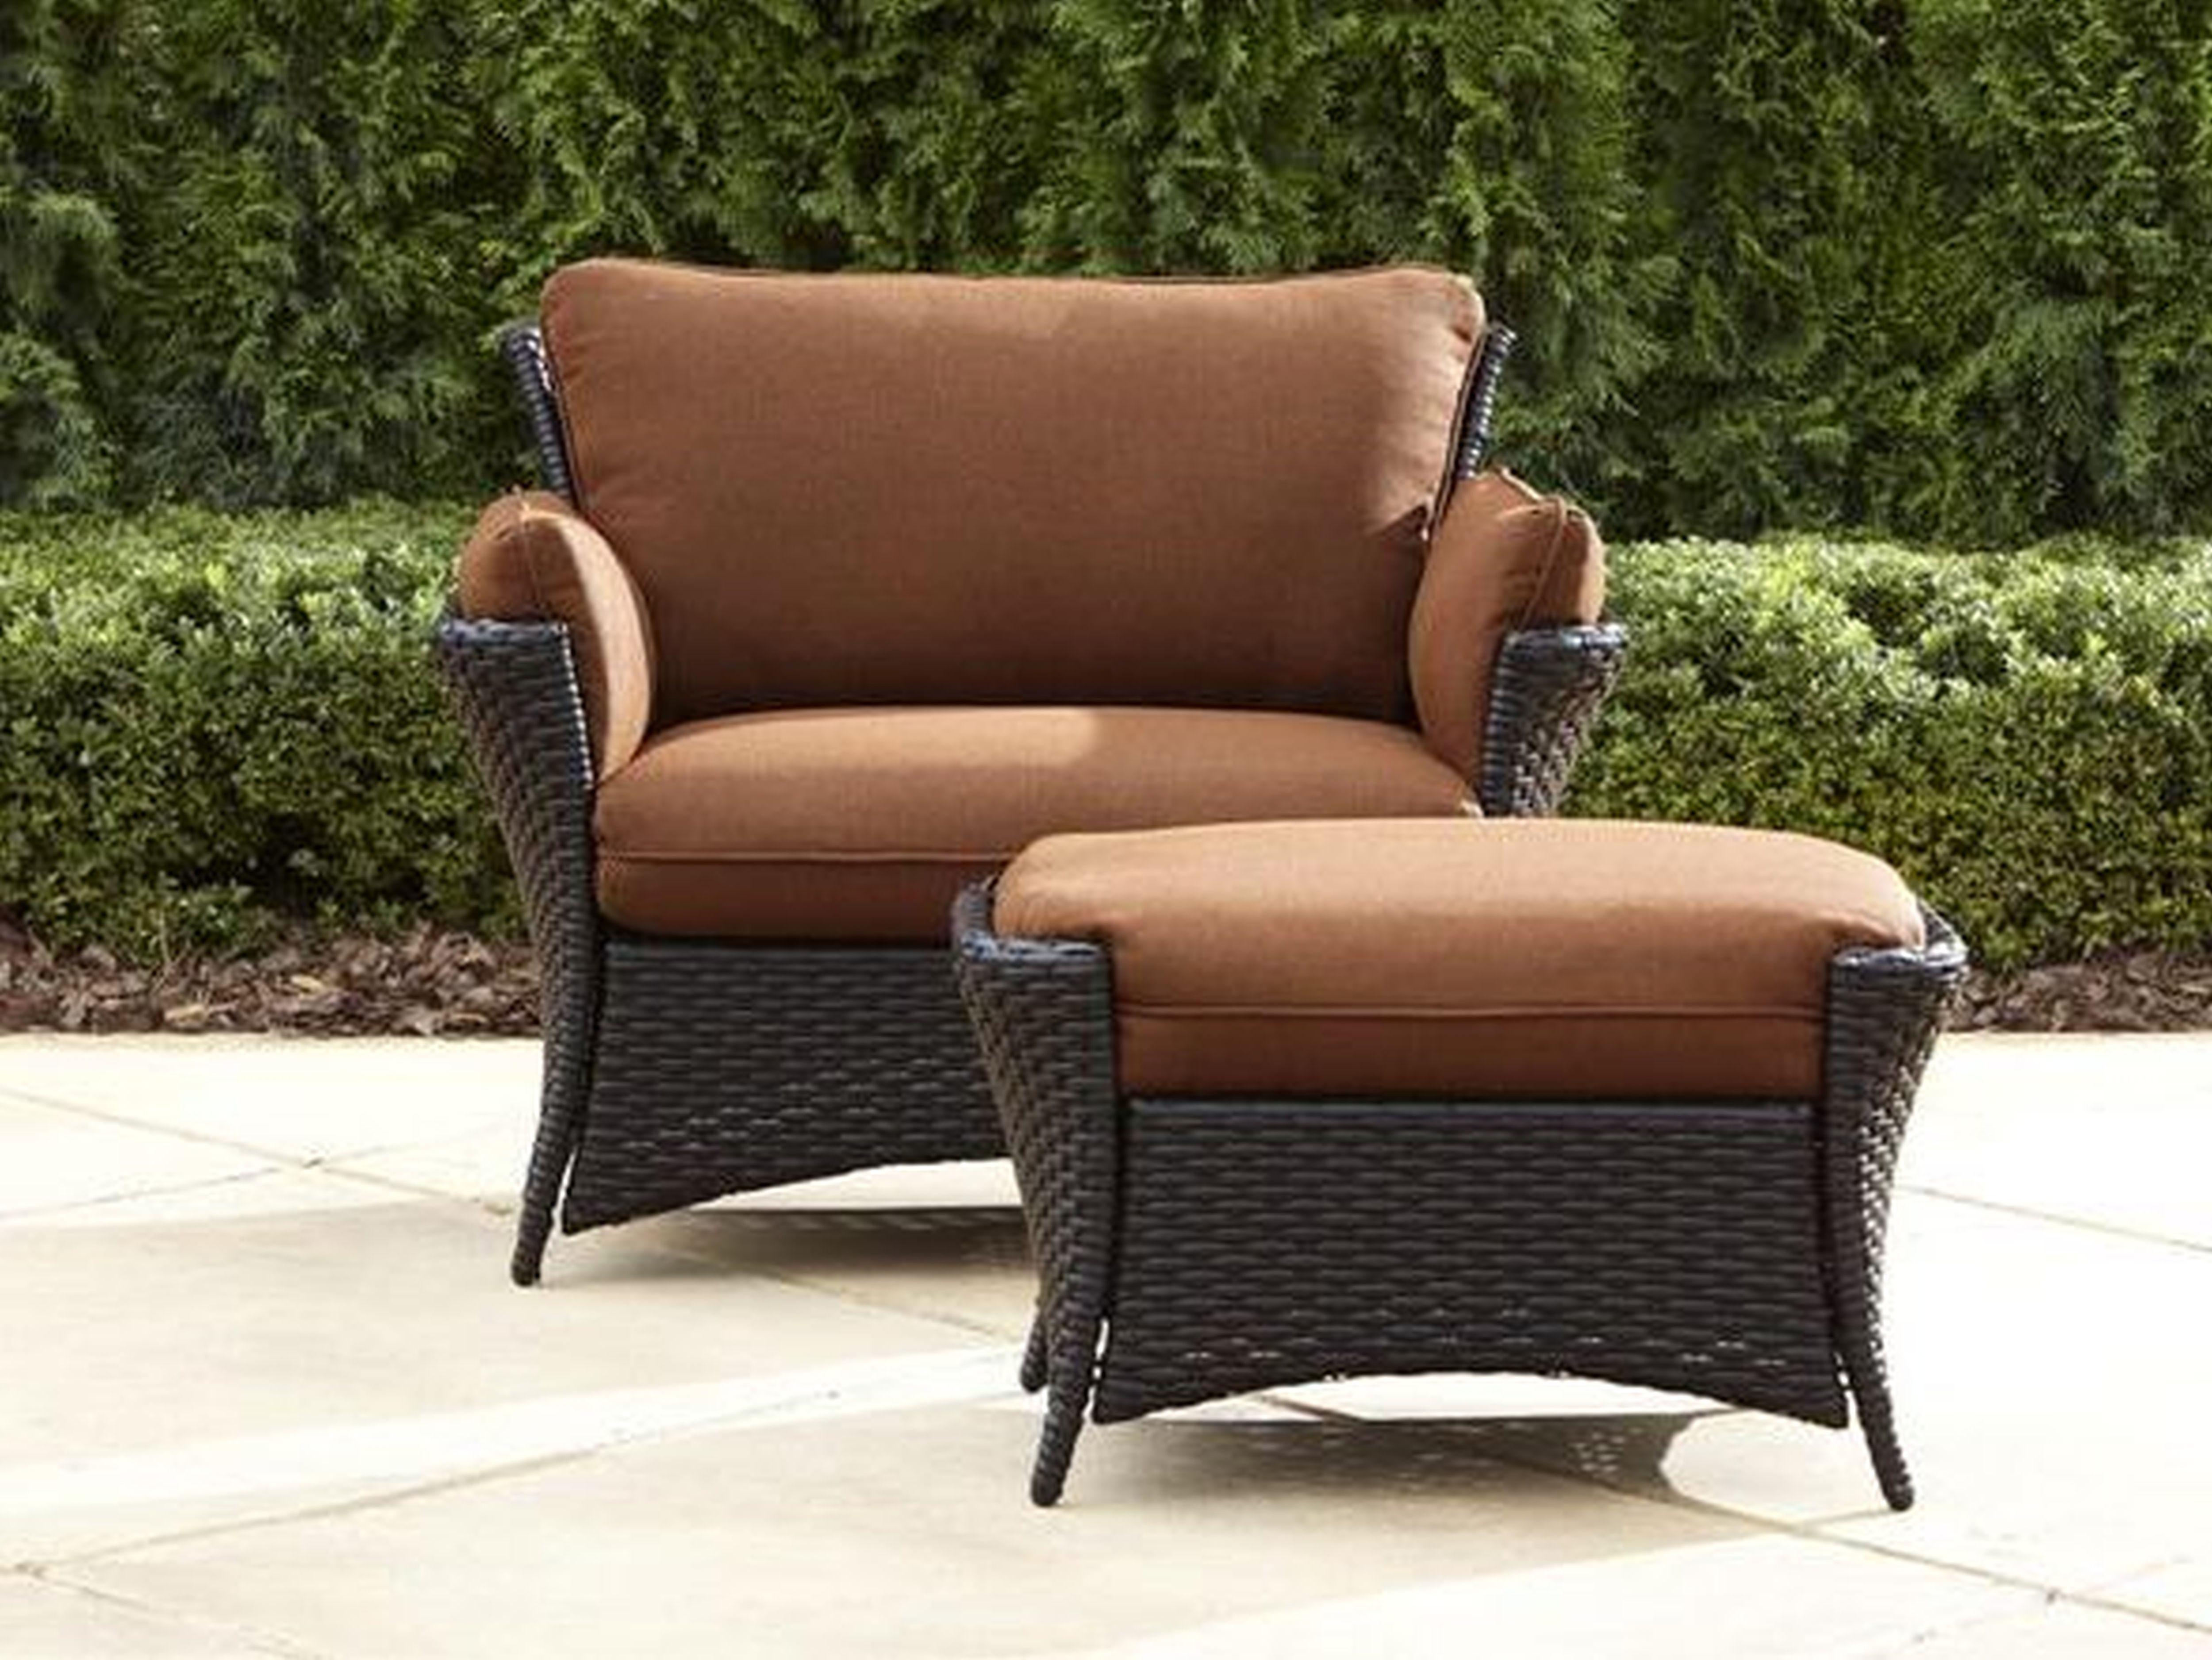 Astounding Outdoor Patio Furniture Decoration Ideas Exterior